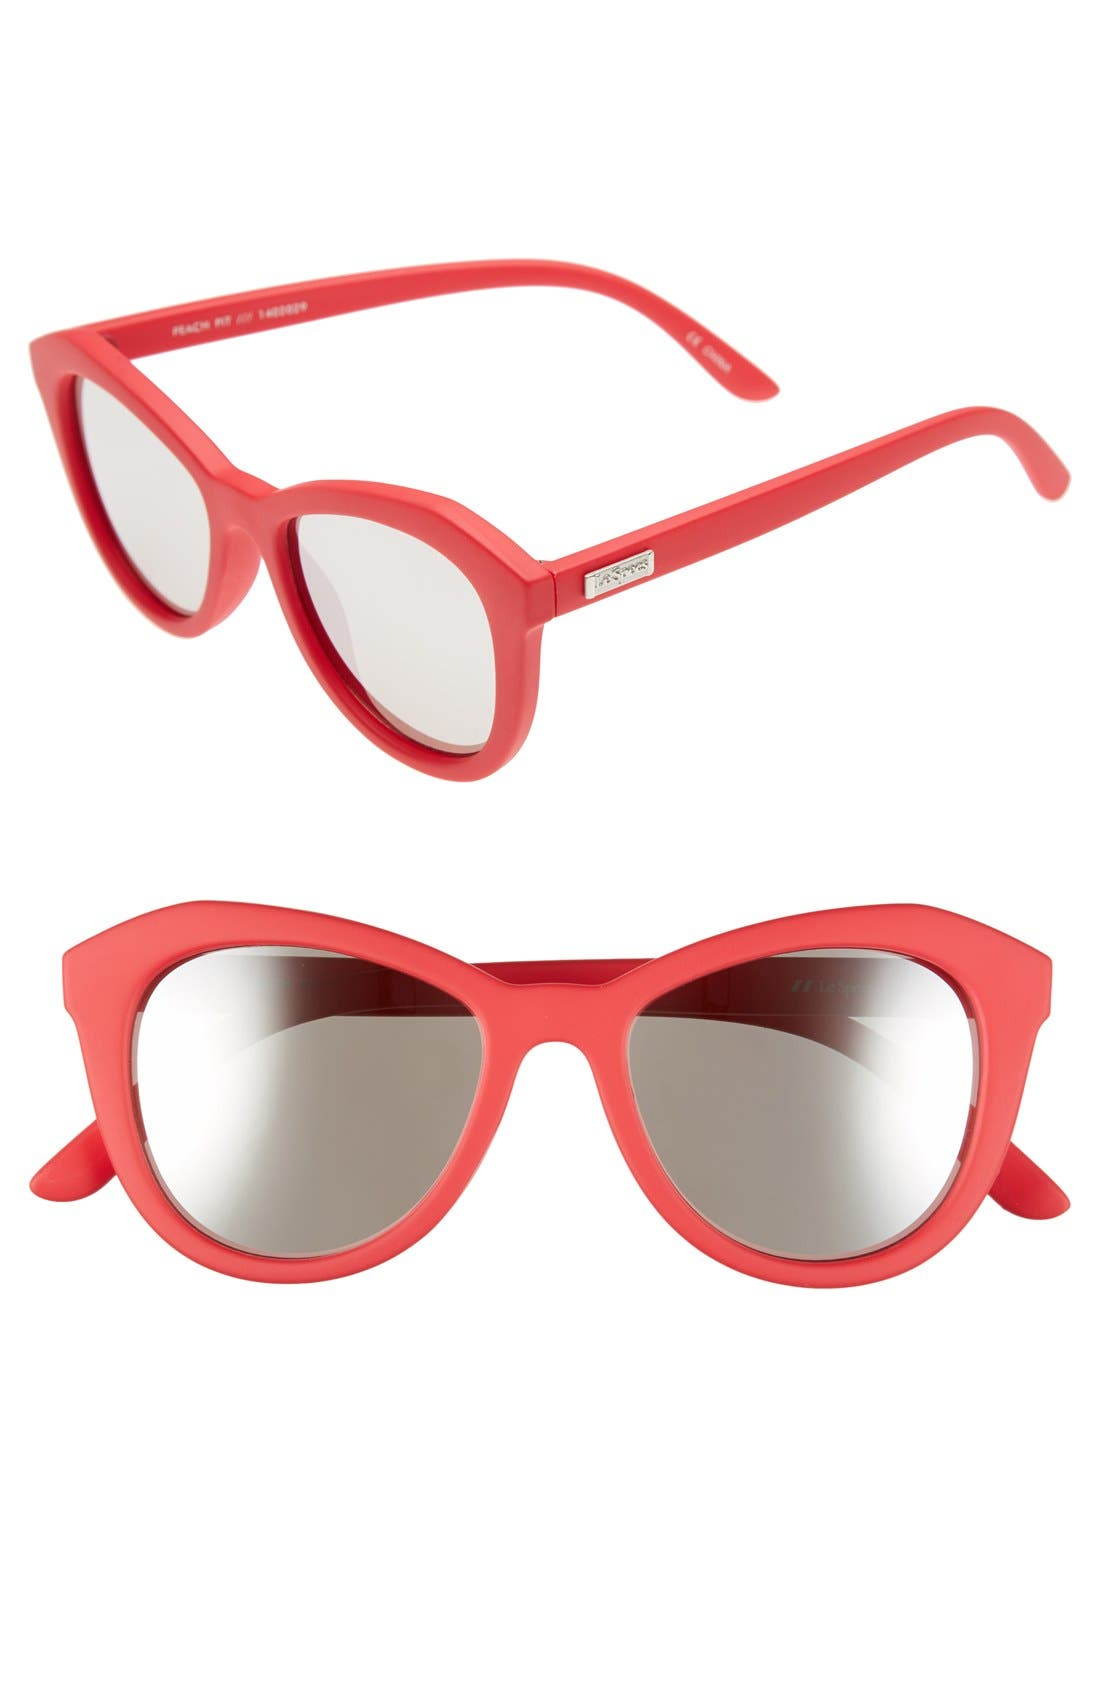 Main Image - Le Specs 'Peach Pit' 52mm Cat Eye Sunglasses